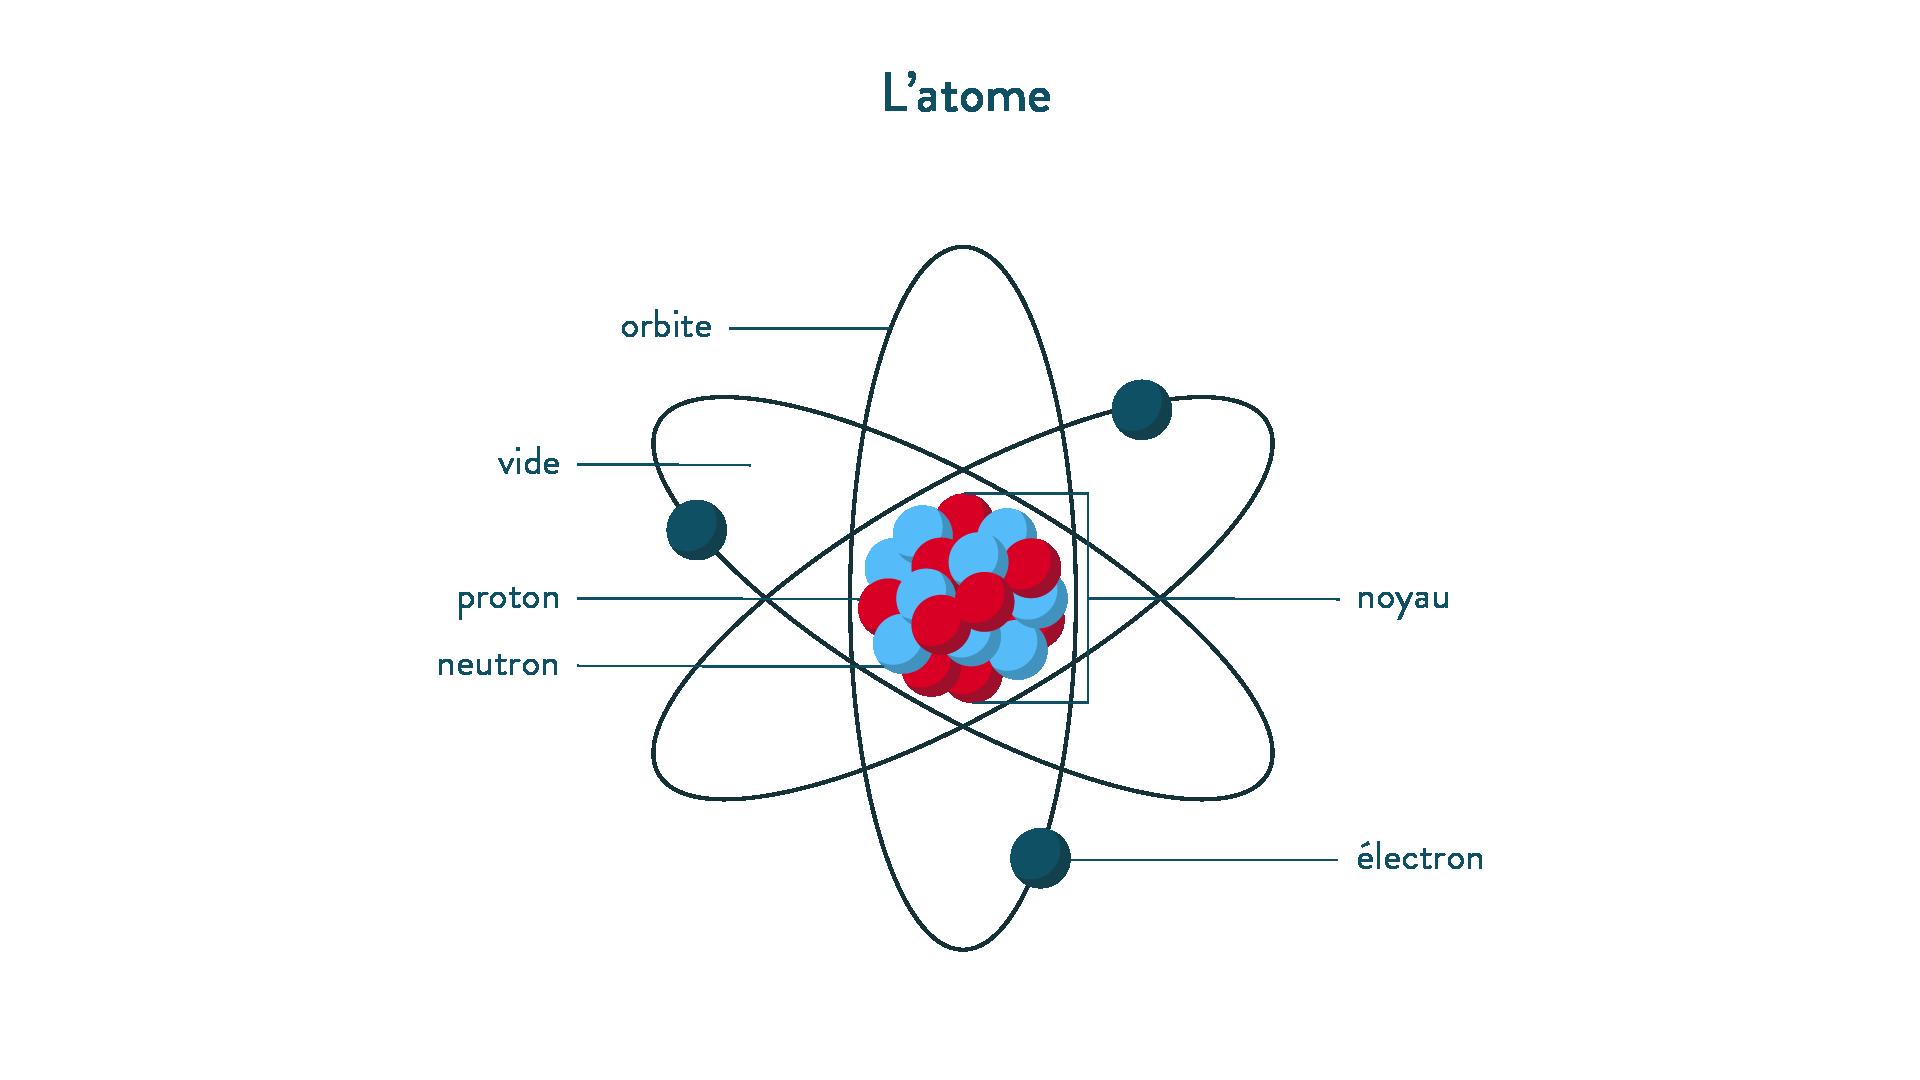 cycle4-pc-c14-img05